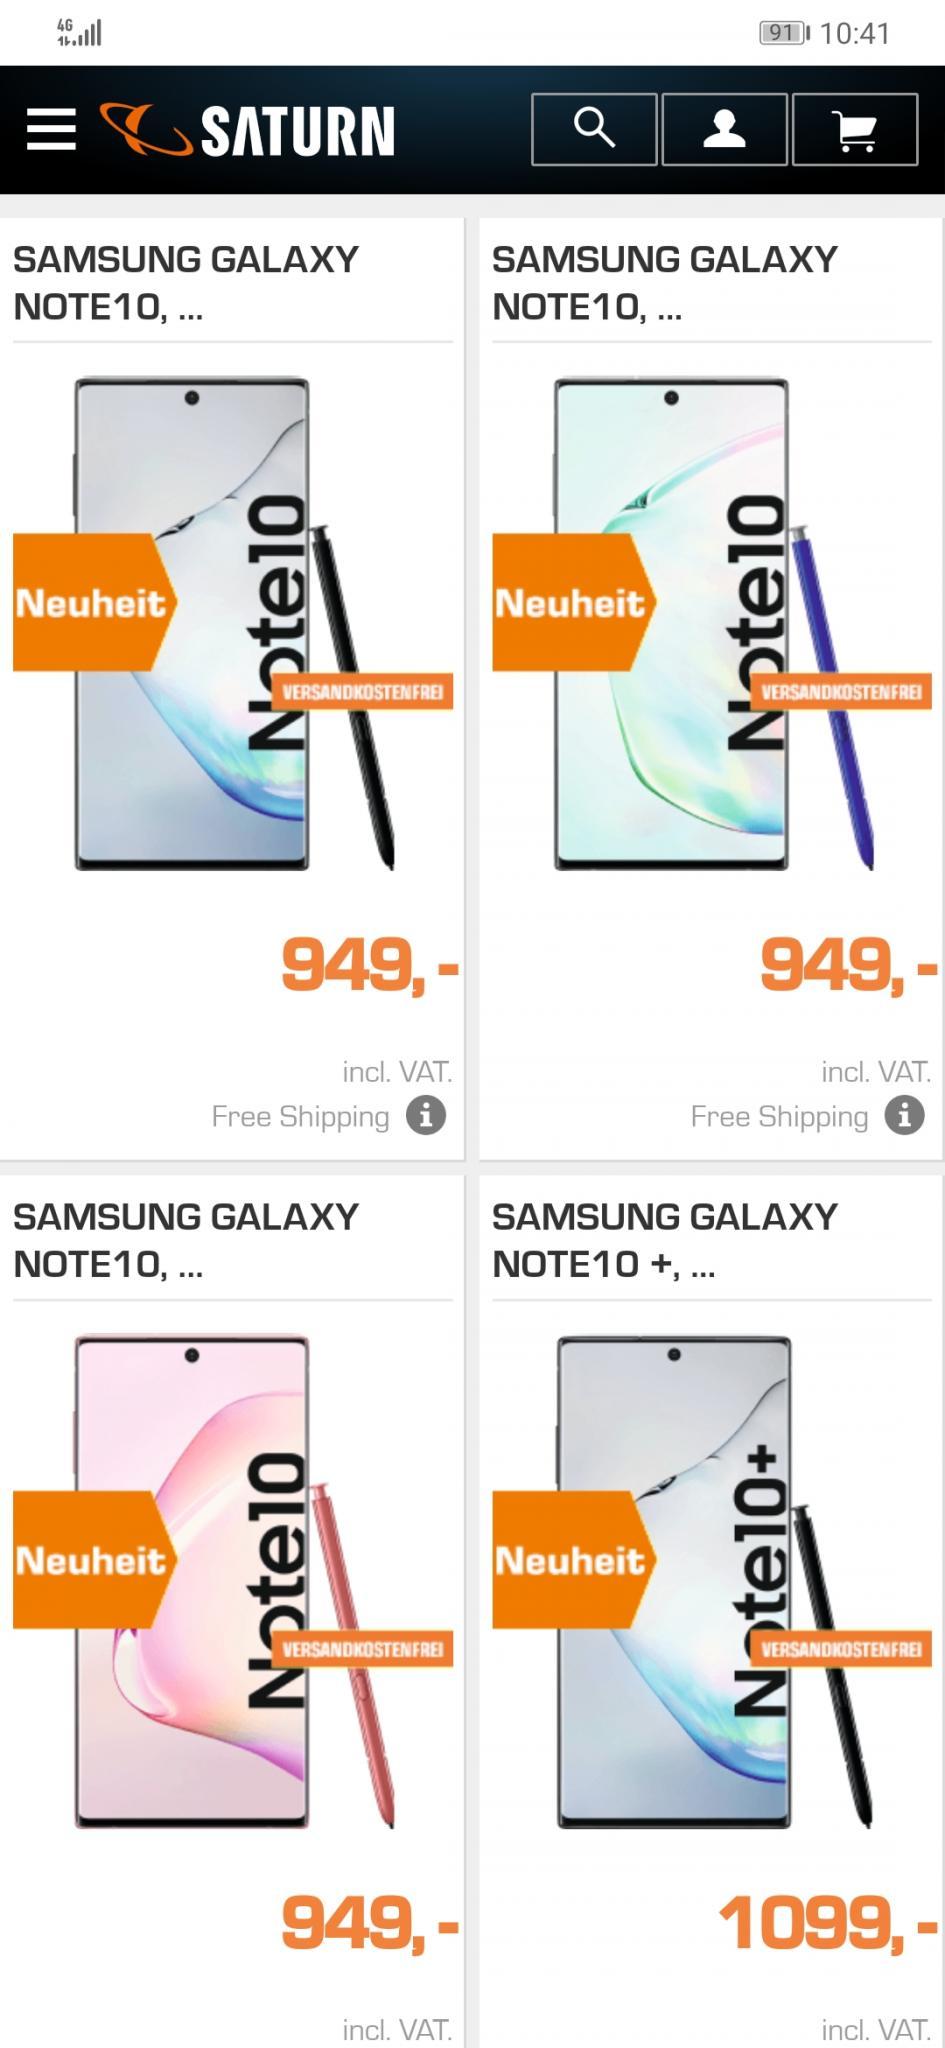 Galaxy Note 10+ τιμή 1099 ευρώ, Galaxy Note 10 τιμή 949 ευρώ [Γερμανία]